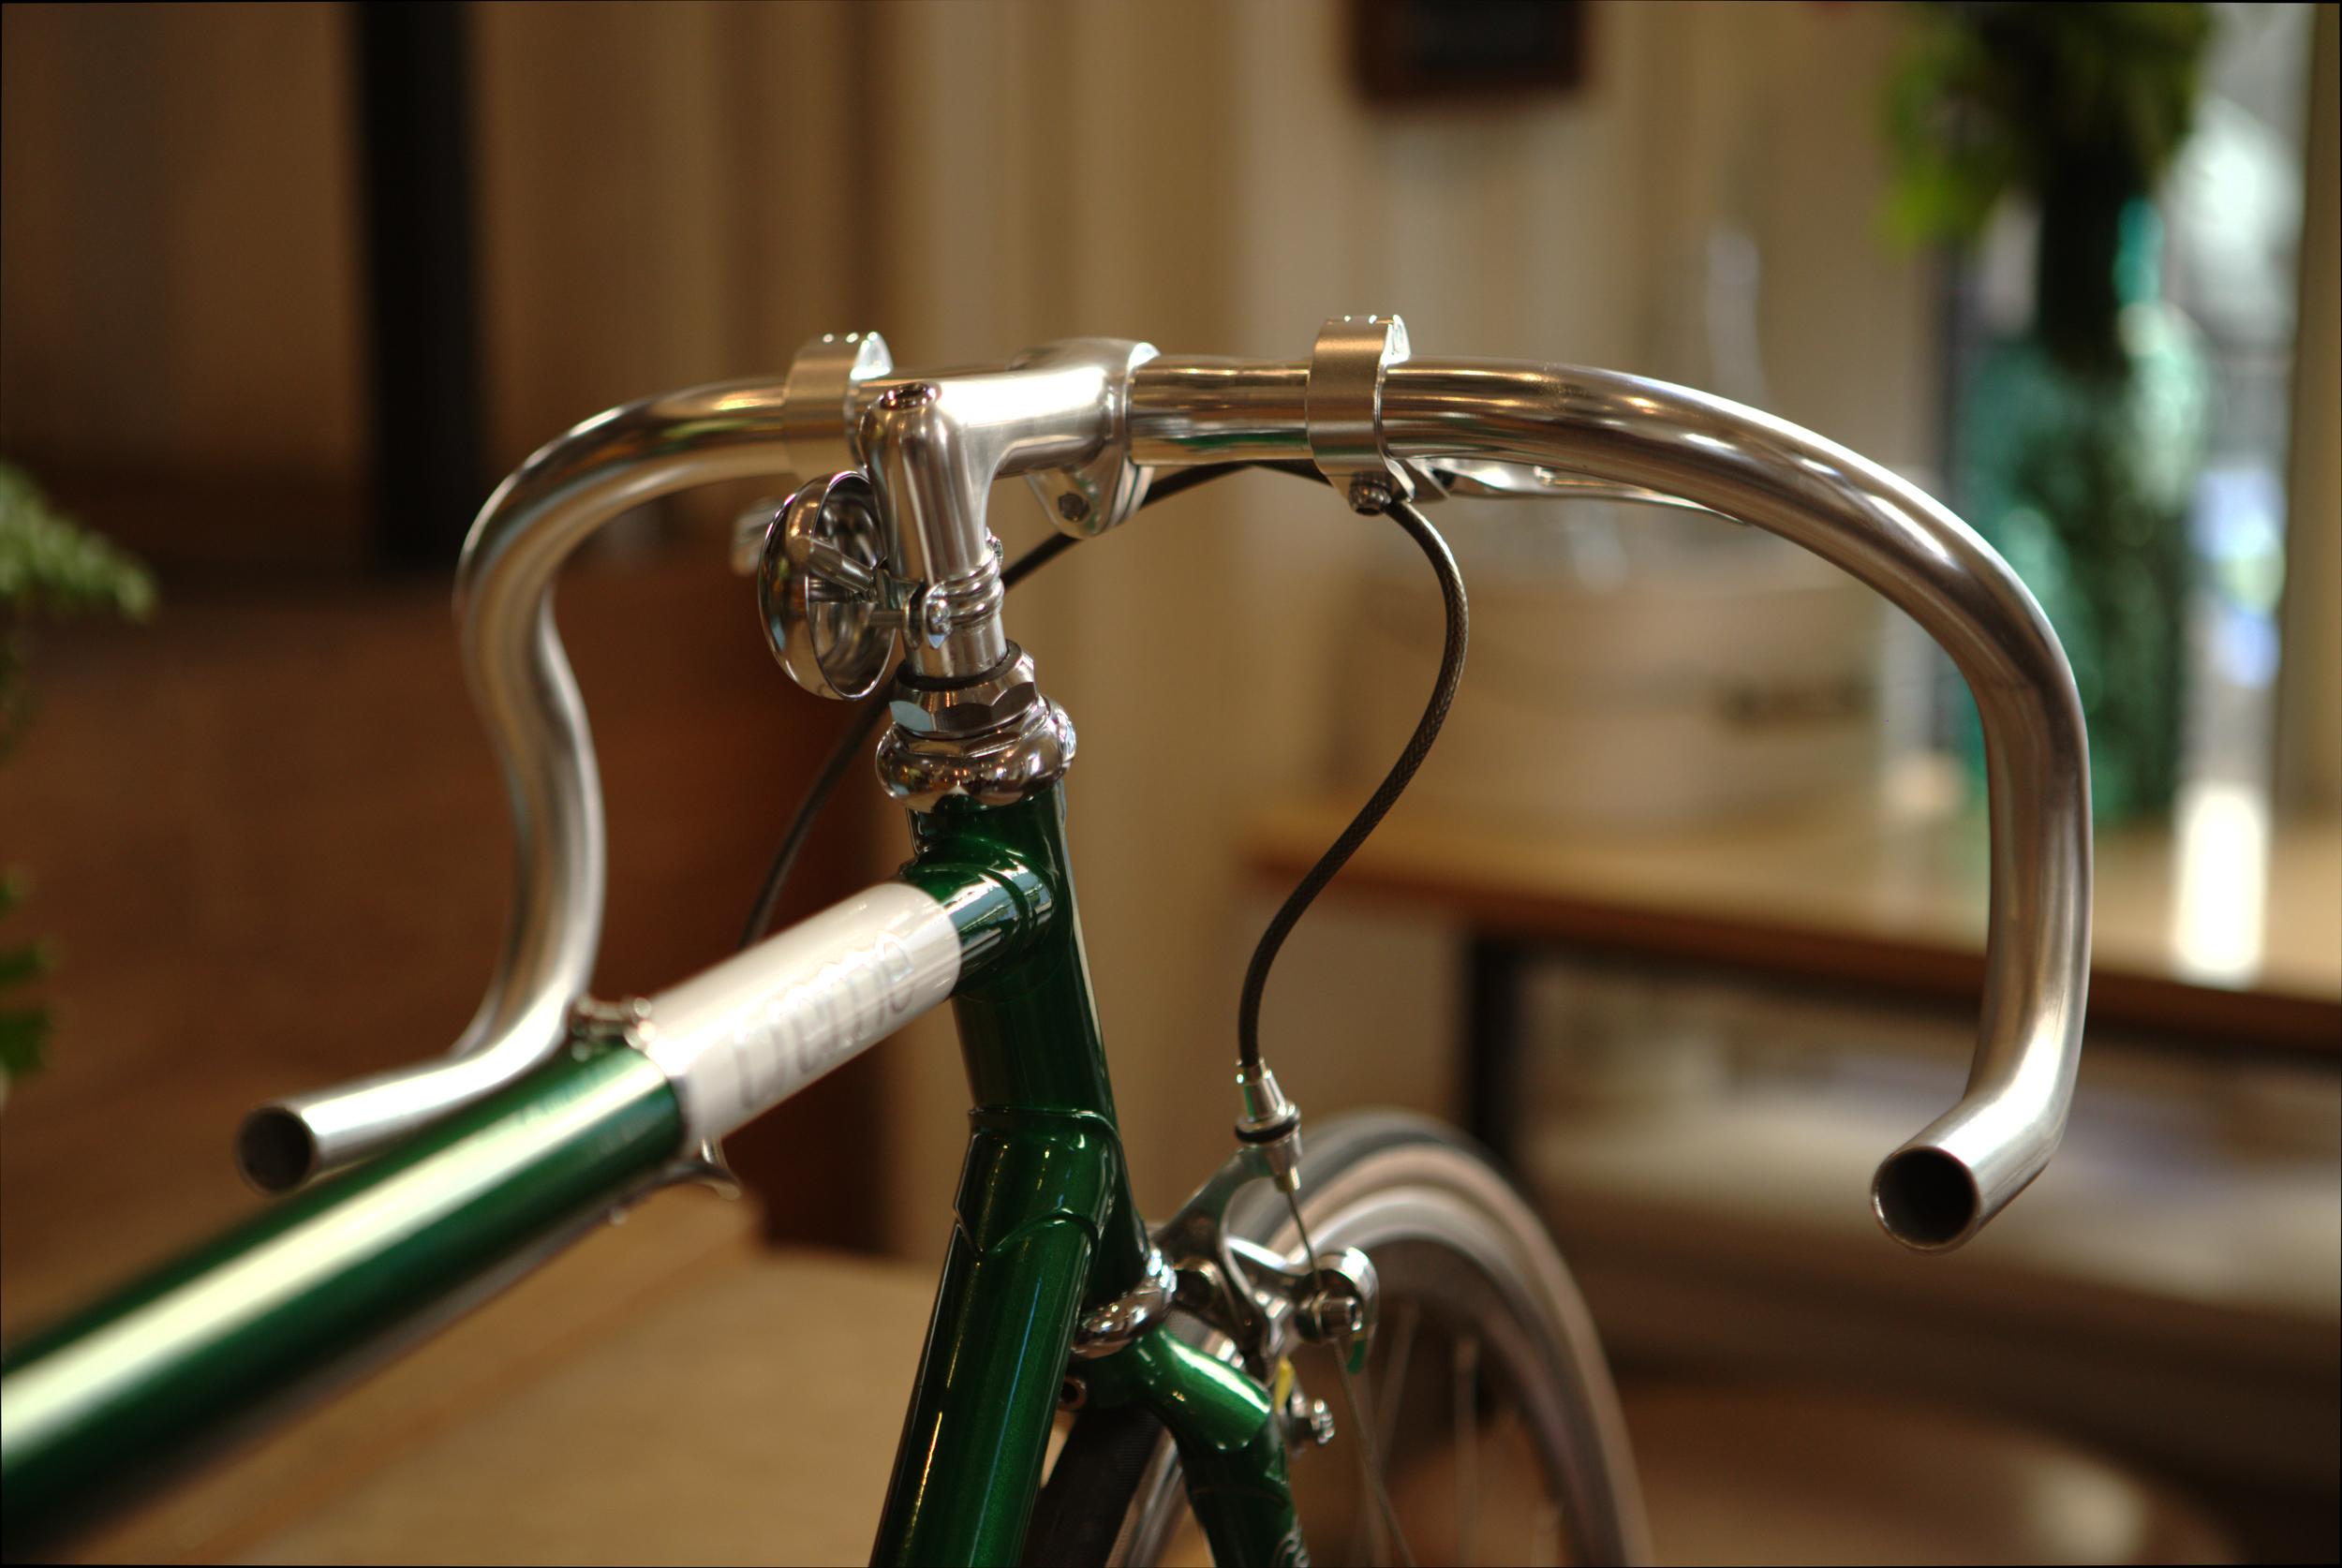 Creme Cycles Fixed Gear Bike Montreal Canada.jpg